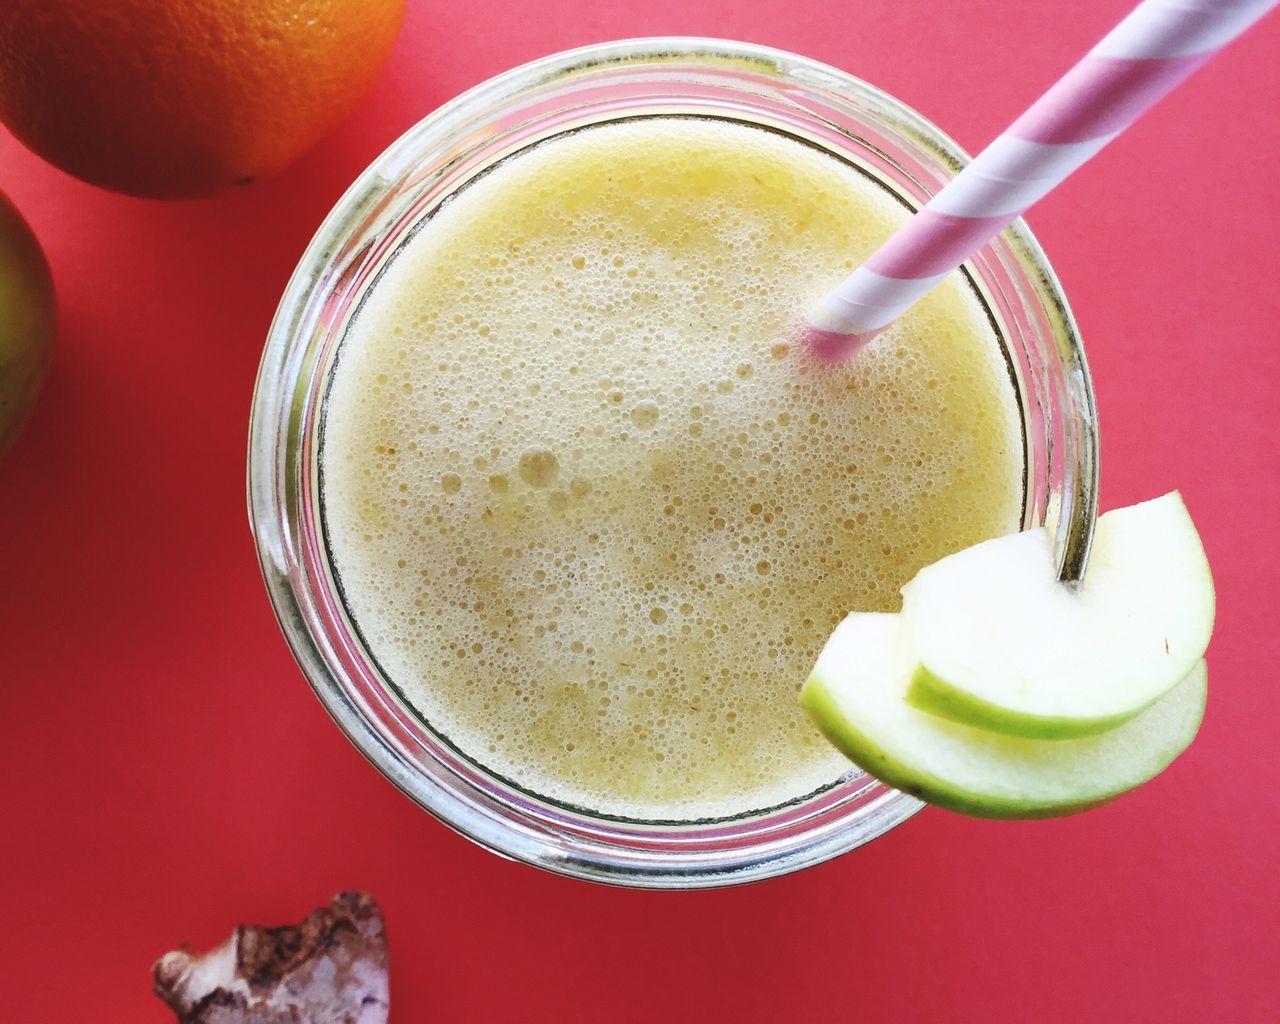 Juice Smoothie Apple Ginger Orange Jar Straw Drink Energy Boost  Juice Cleanse My Favorite Breakfast Moment